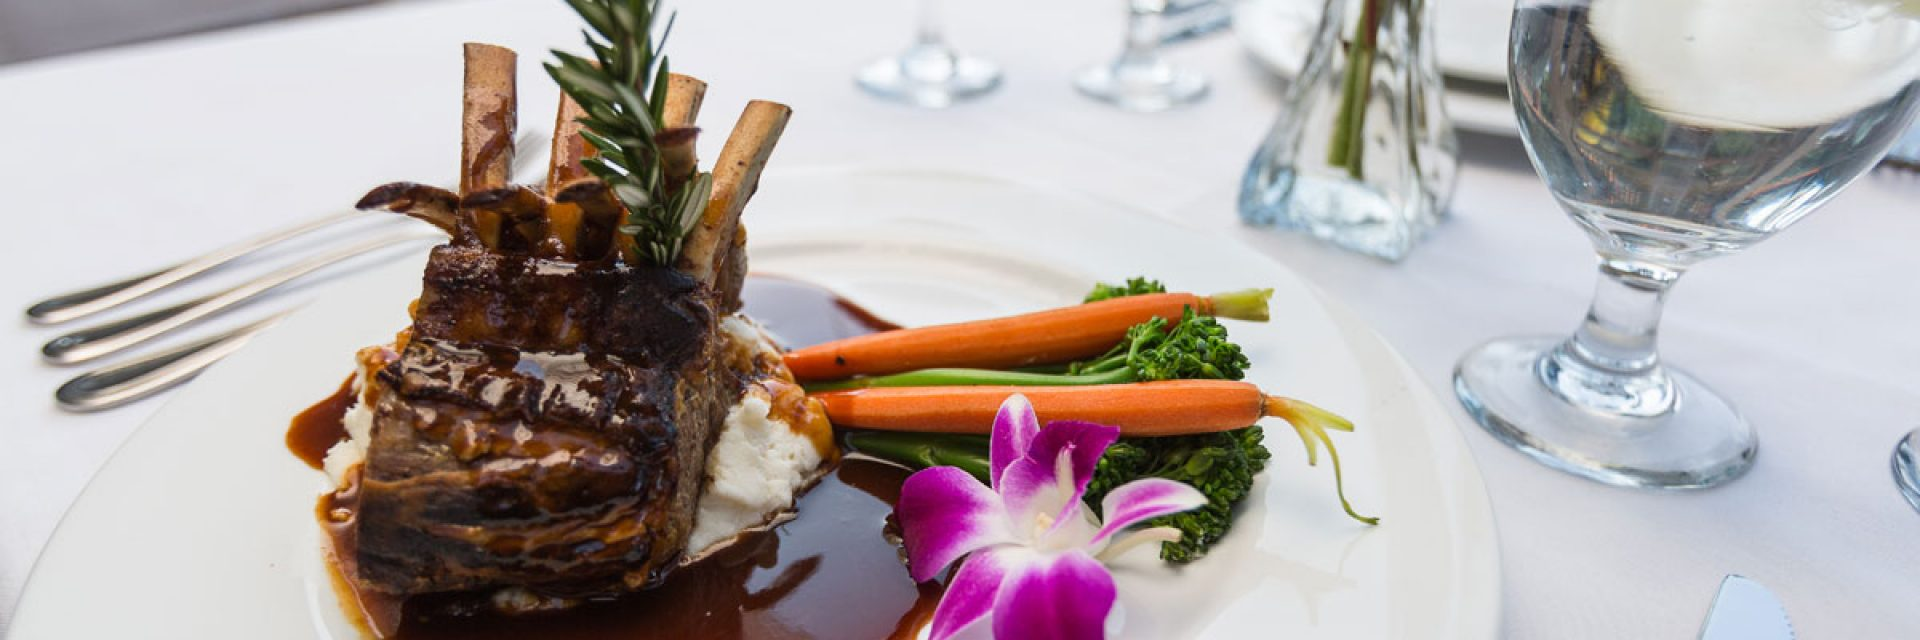 Fine Dining at Morrison's